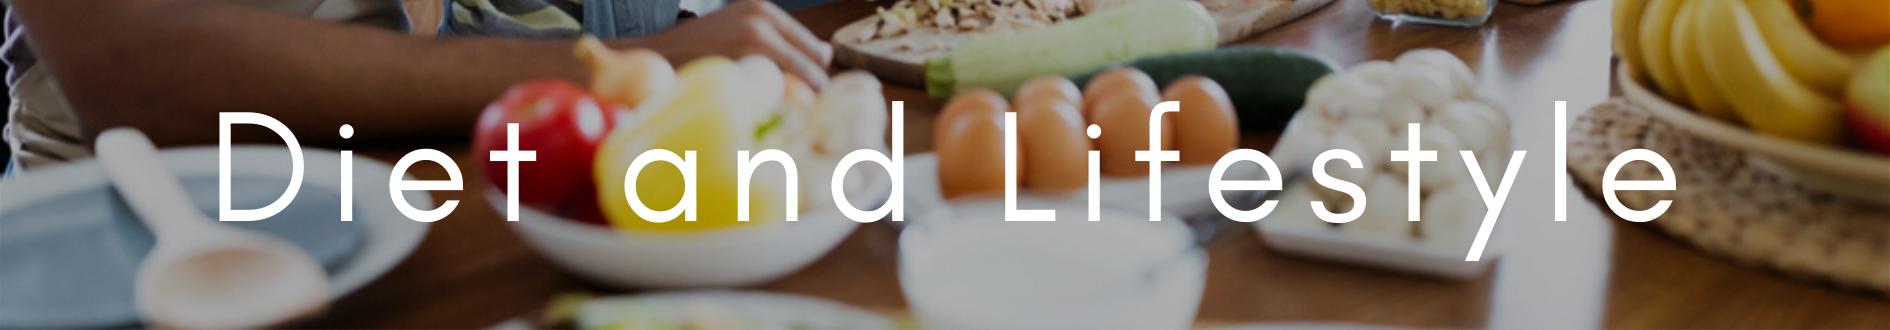 diet and lifestyle header